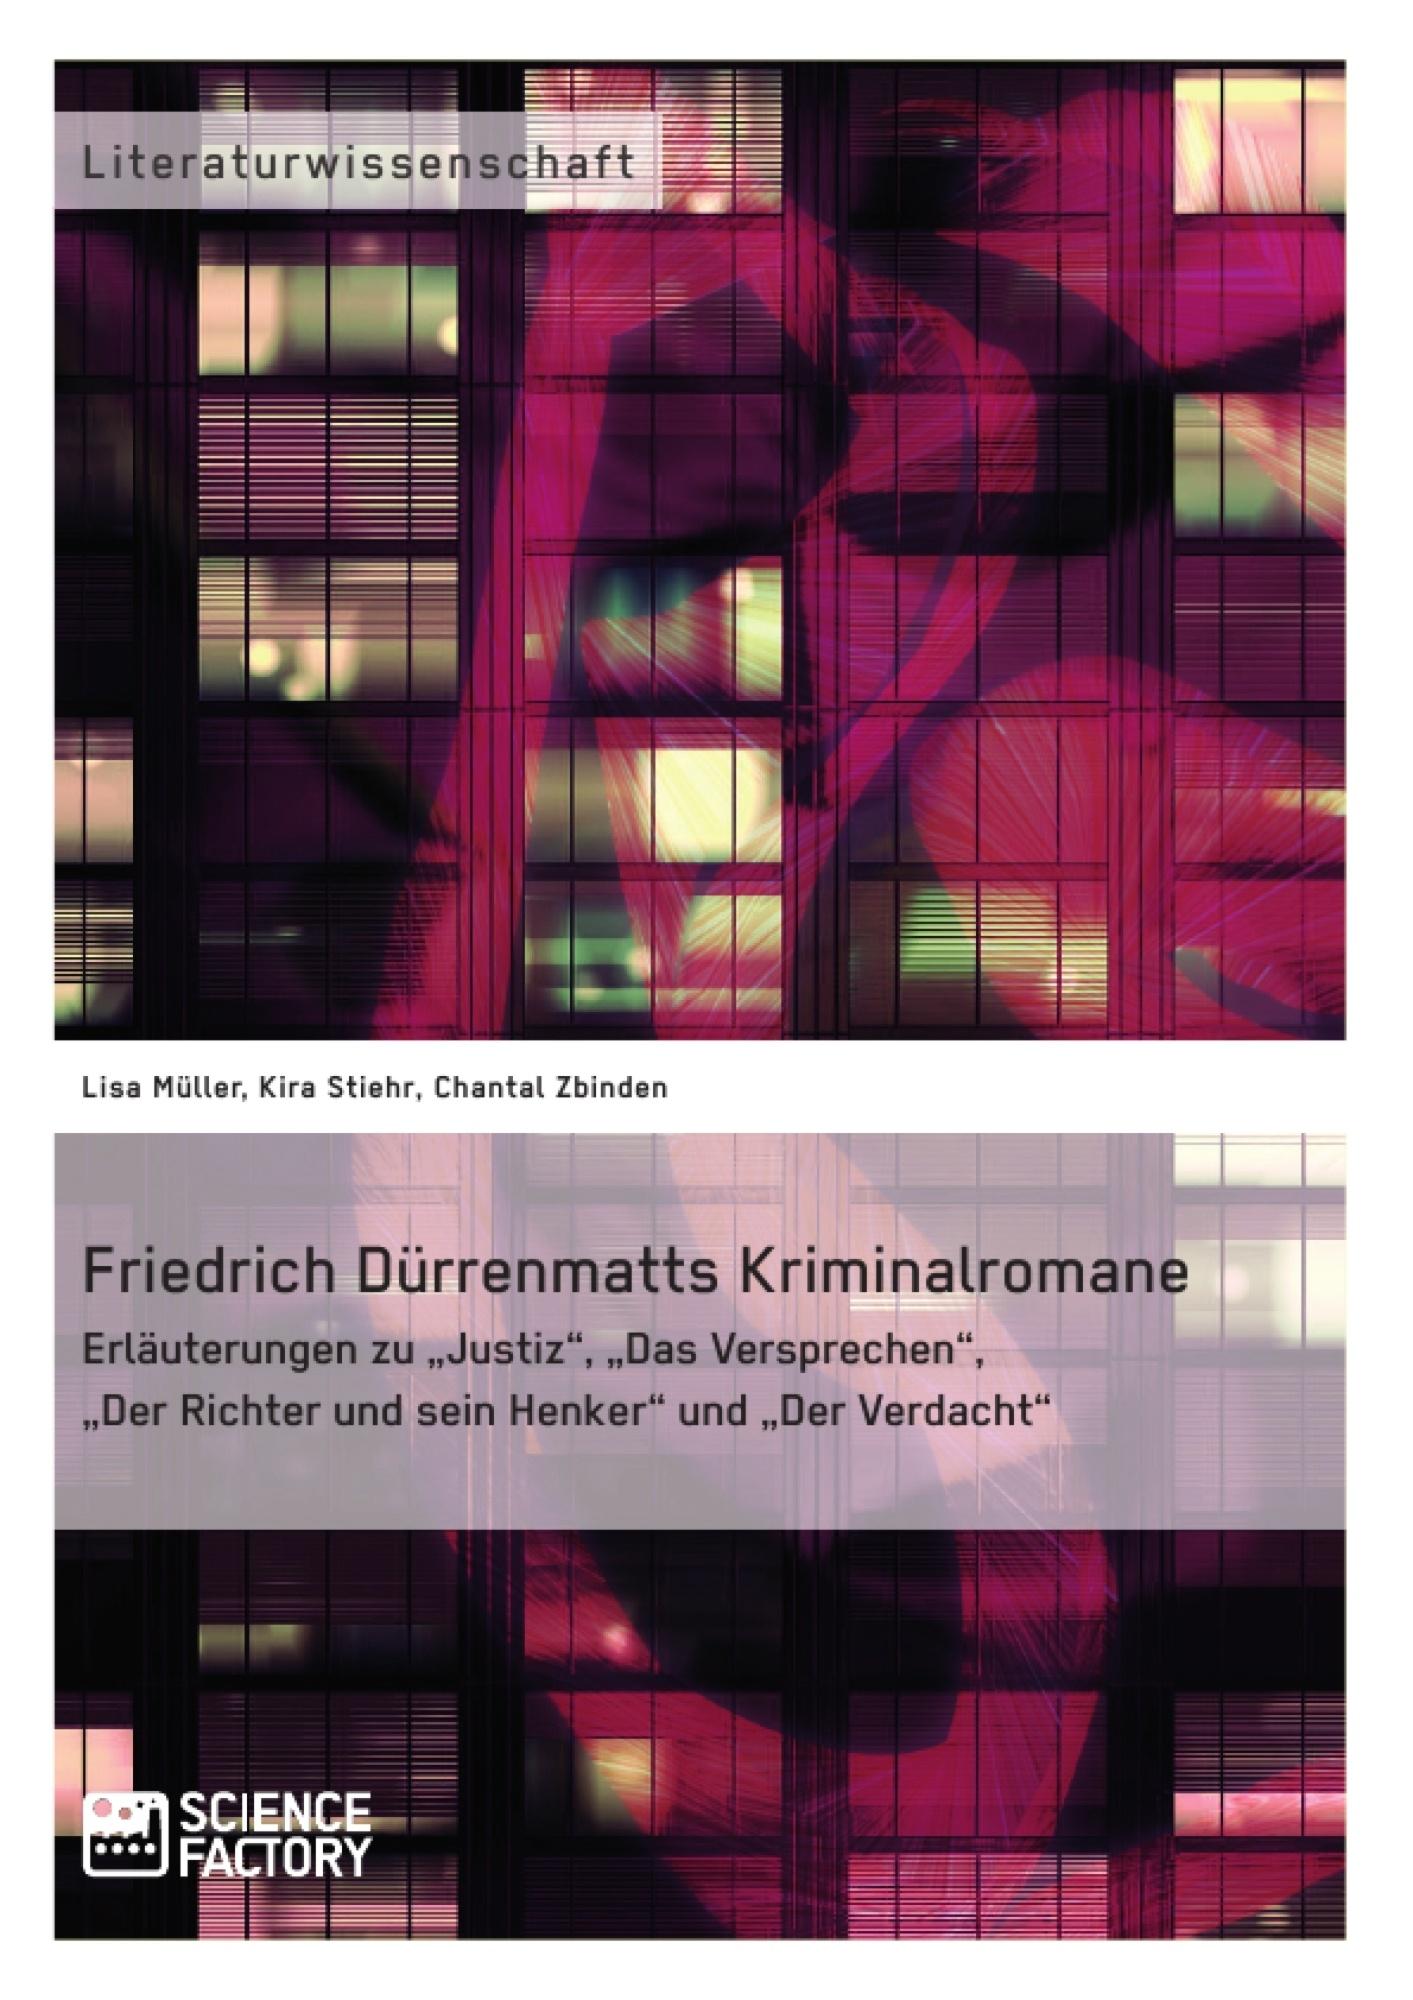 Titel: Friedrich Dürrenmatts Kriminalromane